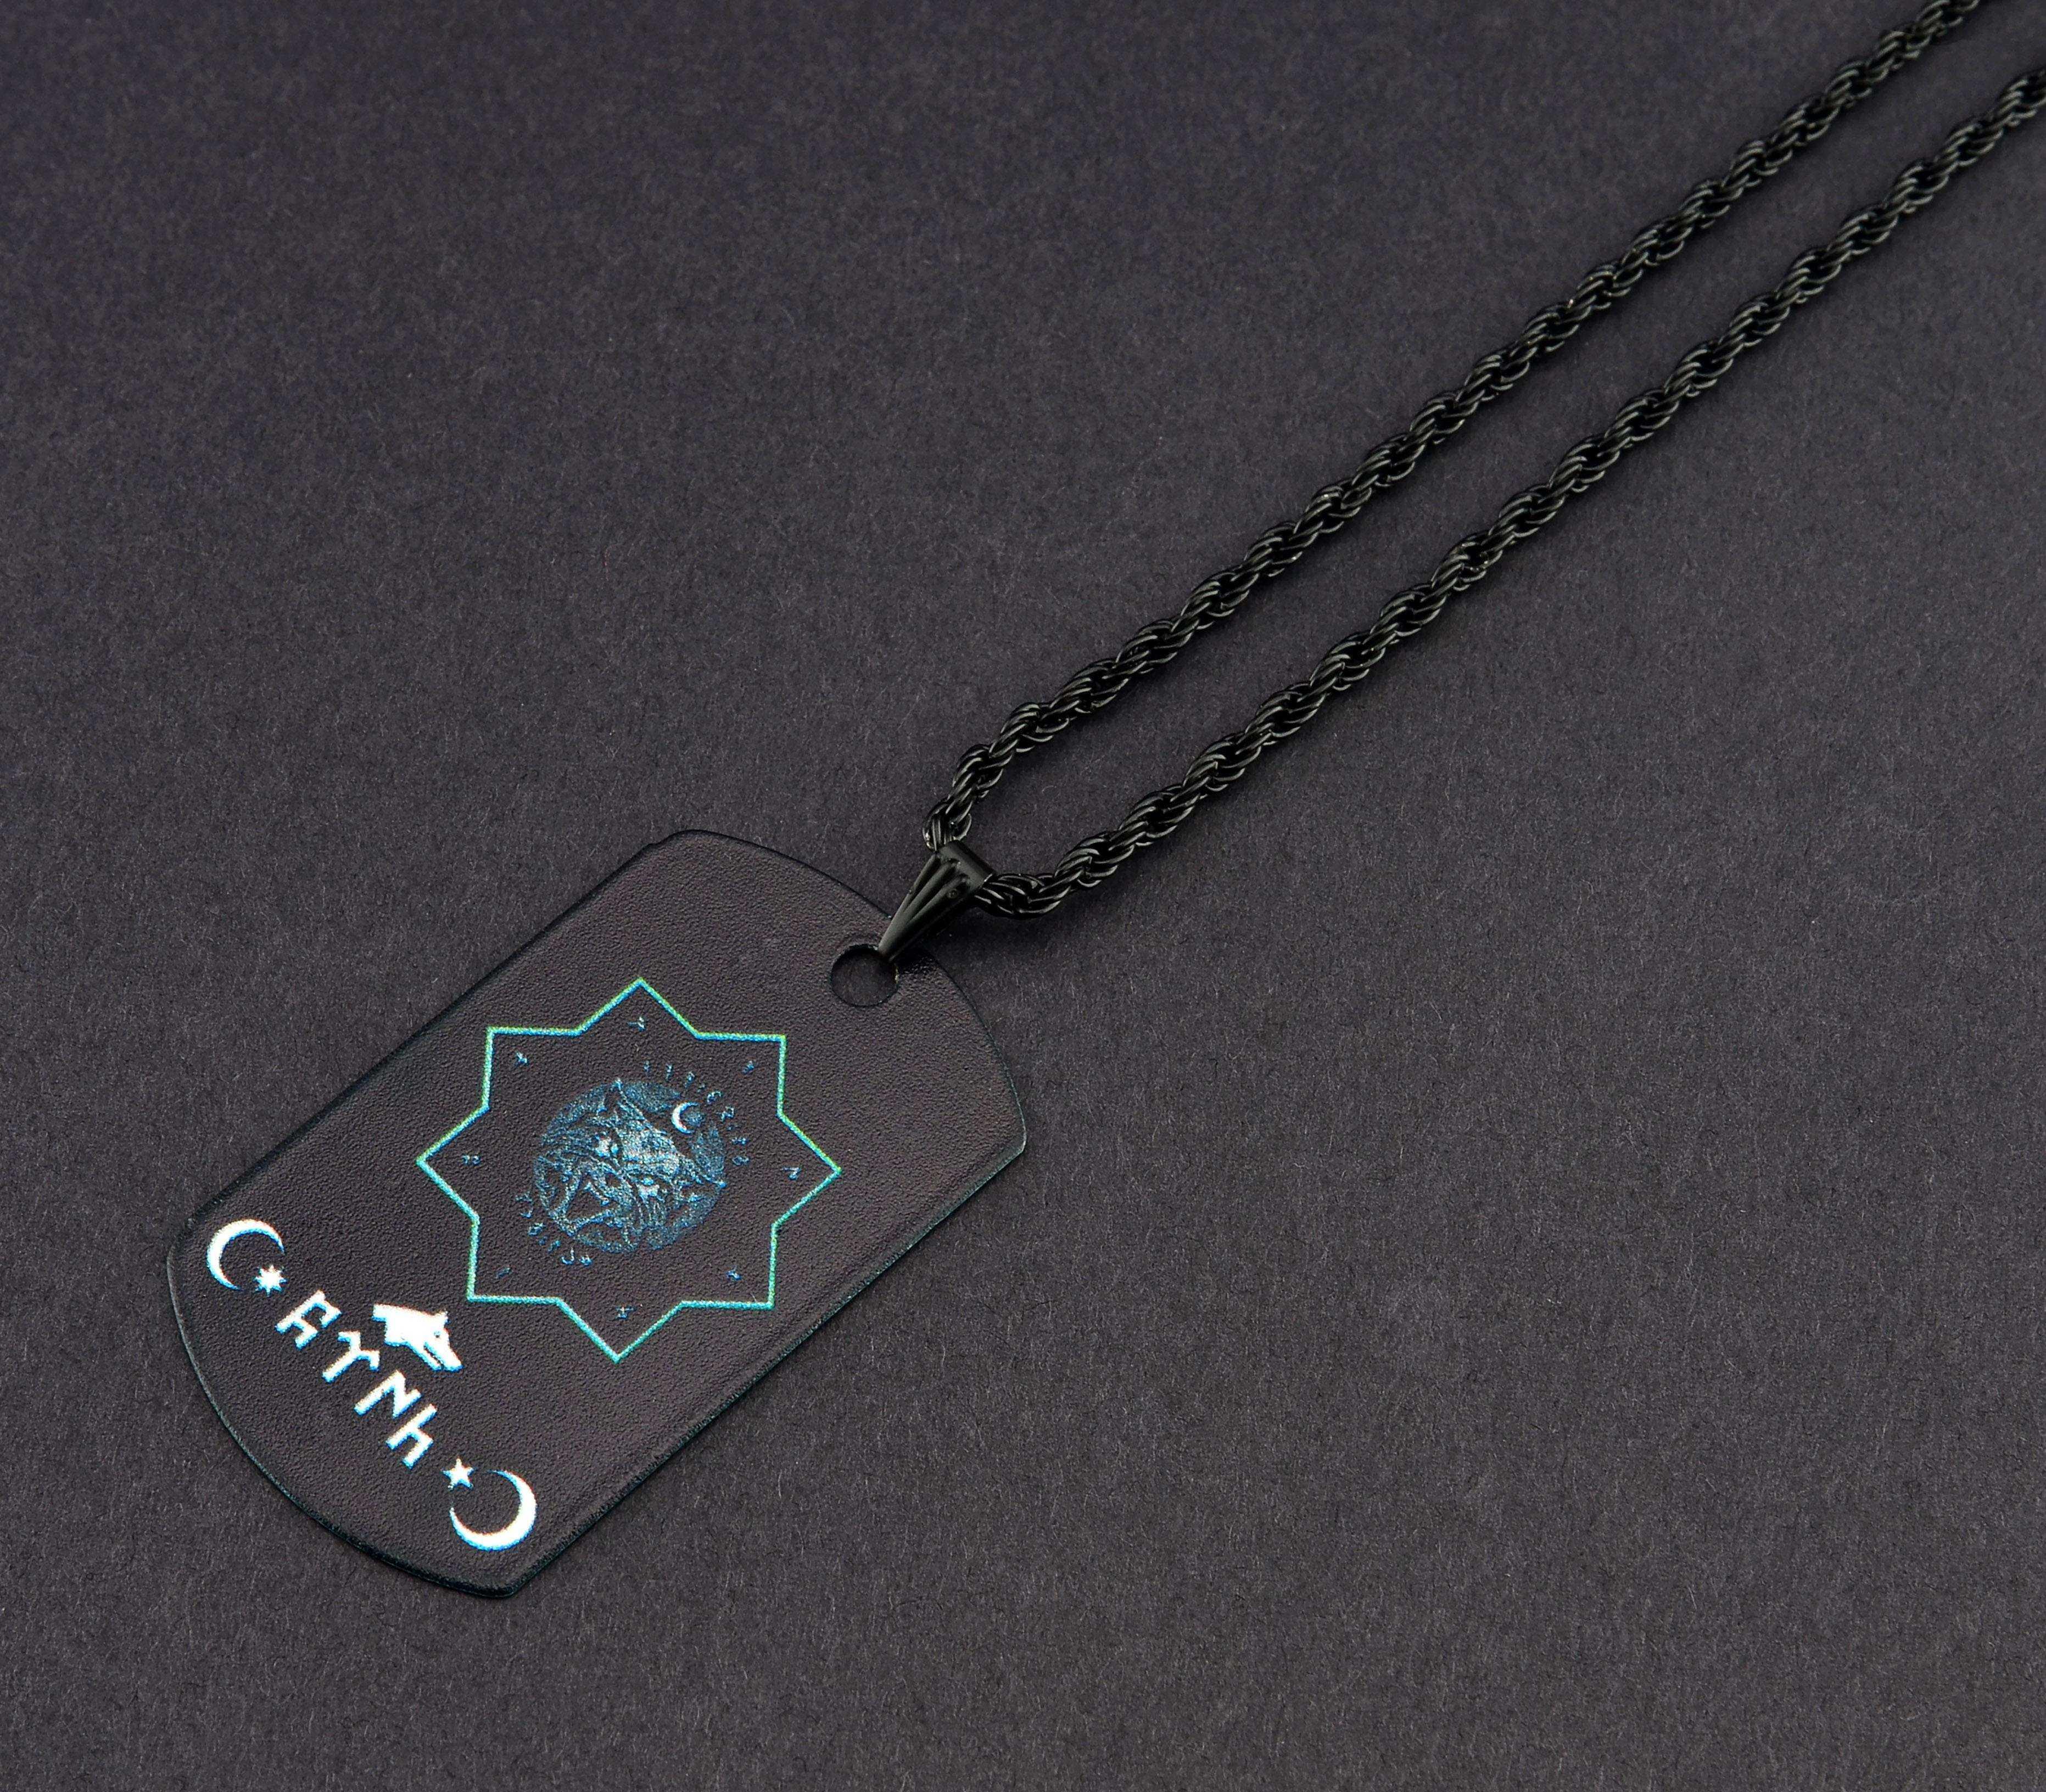 Selçuklu Yıldızı Künye Kolye - KOL0234